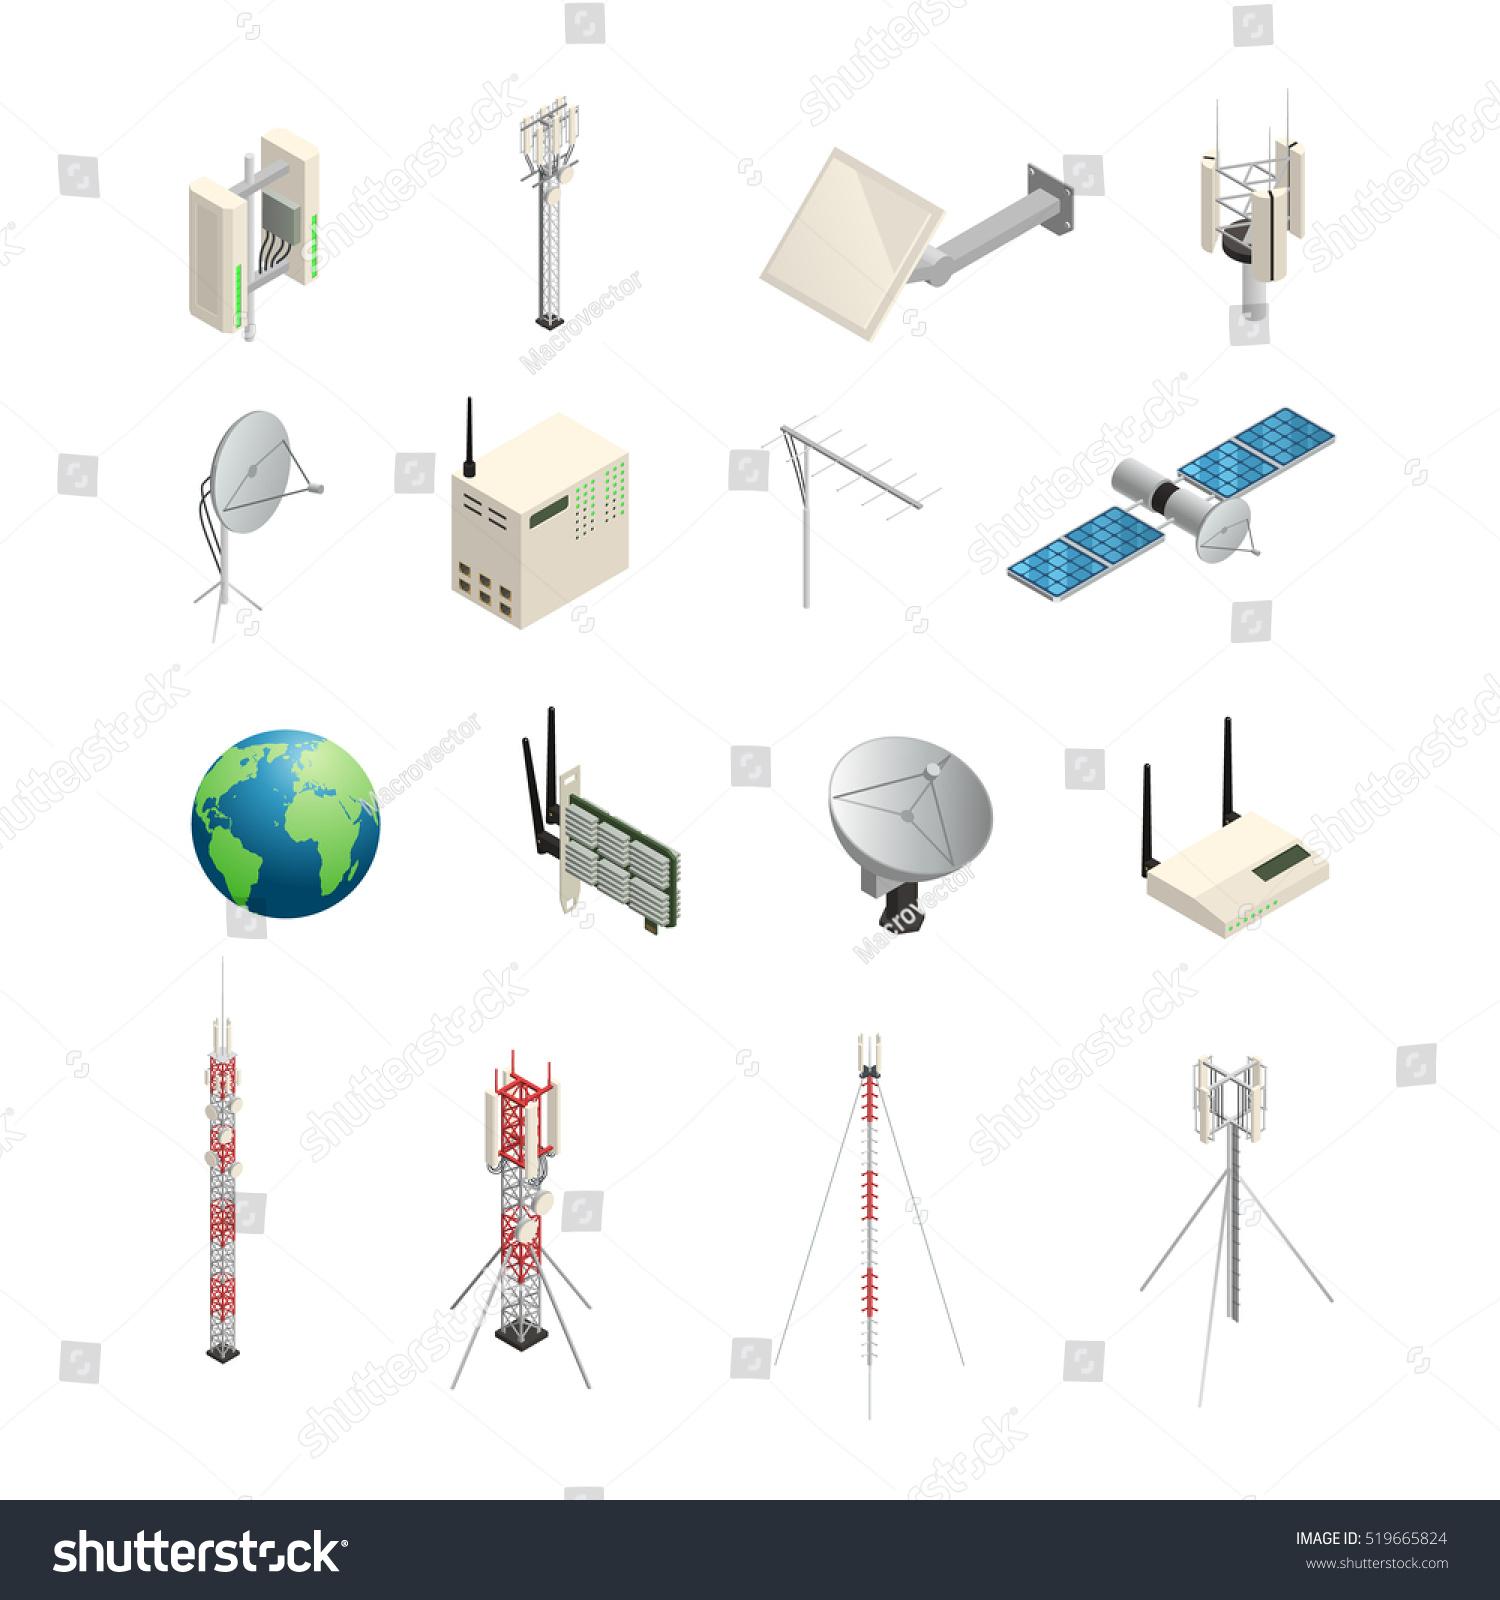 Isometric Icons Set Wireless Communication Equipments Stock Vector ...